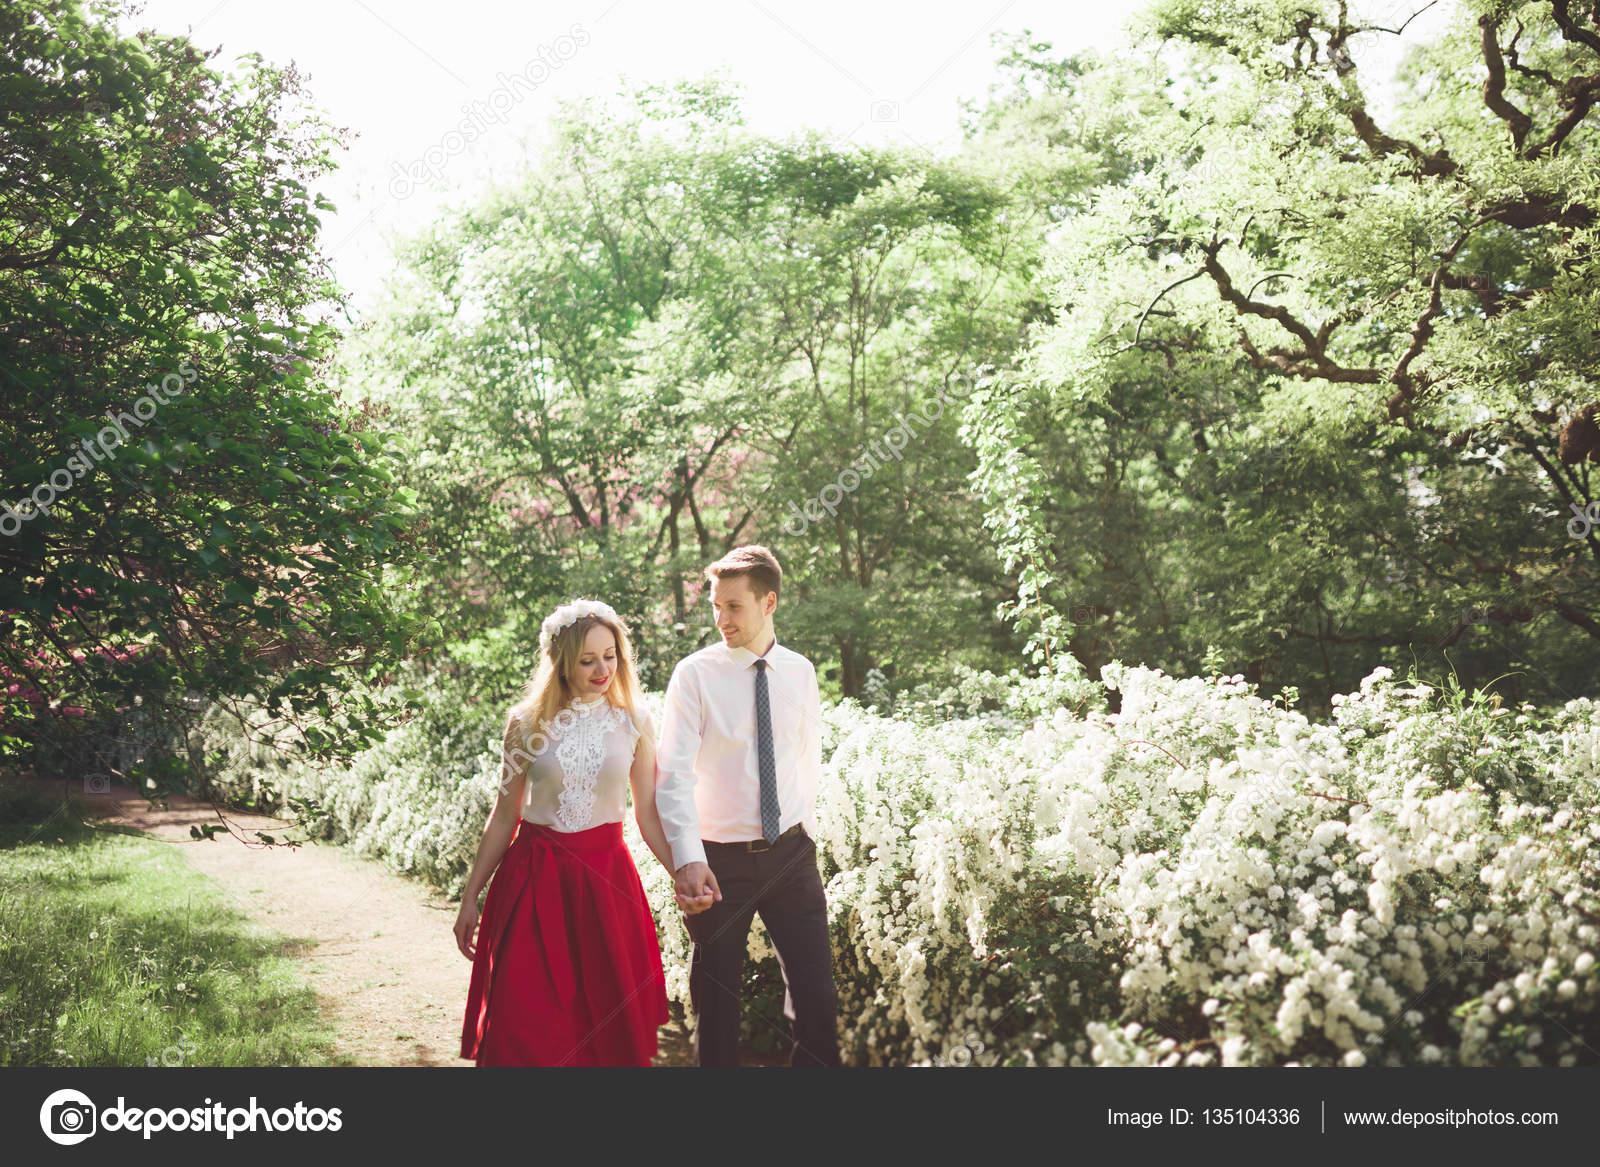 Elegante hermosa boda feliz pareja bes ndose y abraz ndose for Boda en jardin botanico